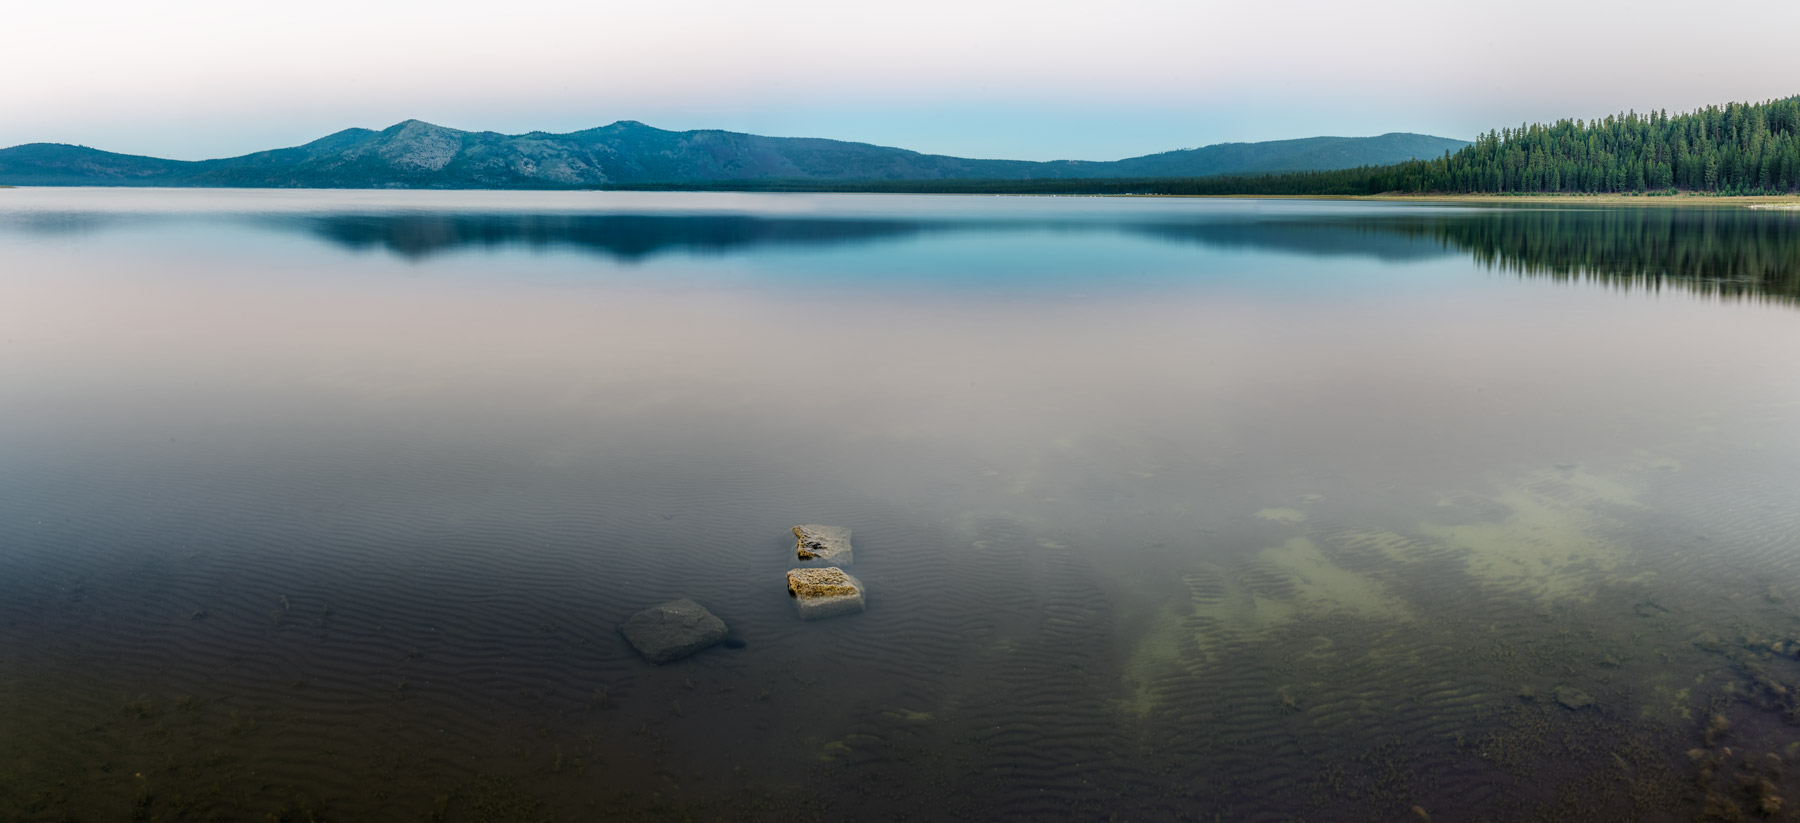 Rocks-Eagle-Lake-Twilight-Pano-#MERGED_DSC7041-7053-HDR-1.jpg